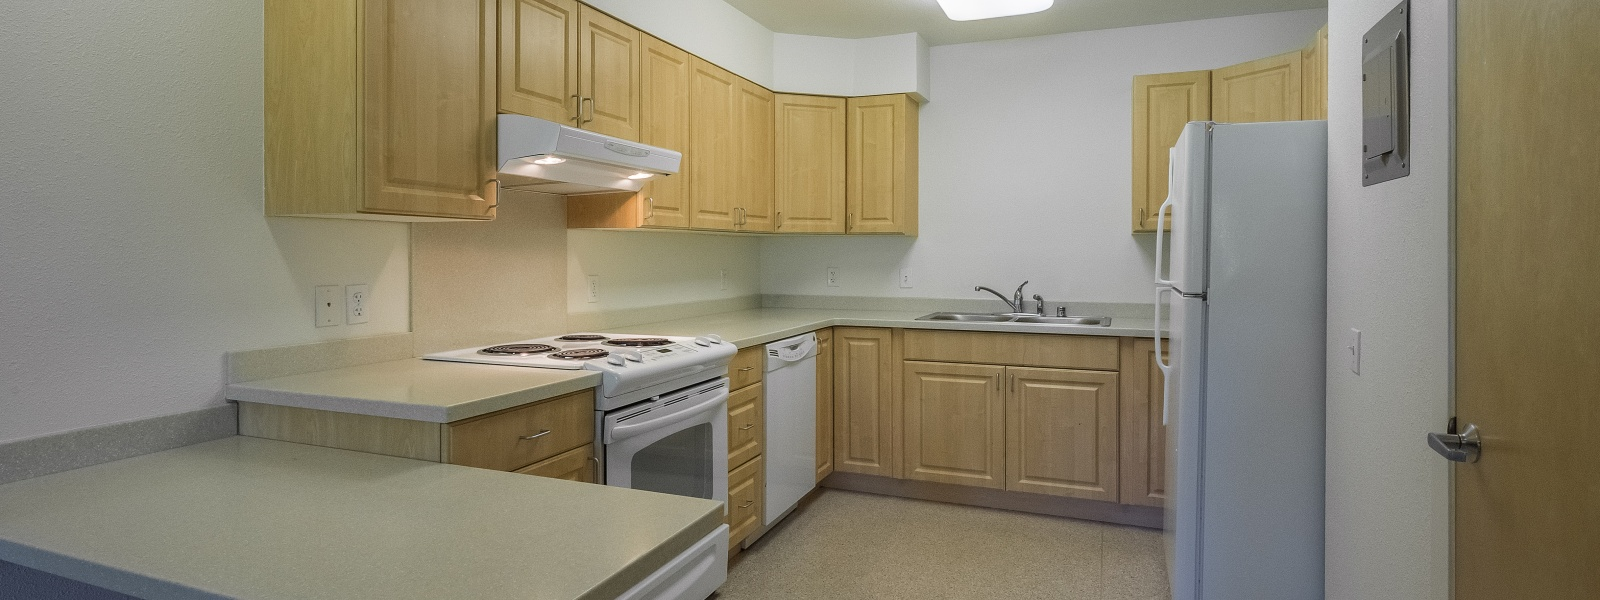 52394 6th Avenue #25, Kenai, Alaska, 99611, 1 Bedroom Bedrooms, ,1 BathroomBathrooms,Apartment,For Rent,6th Avenue #25,1016